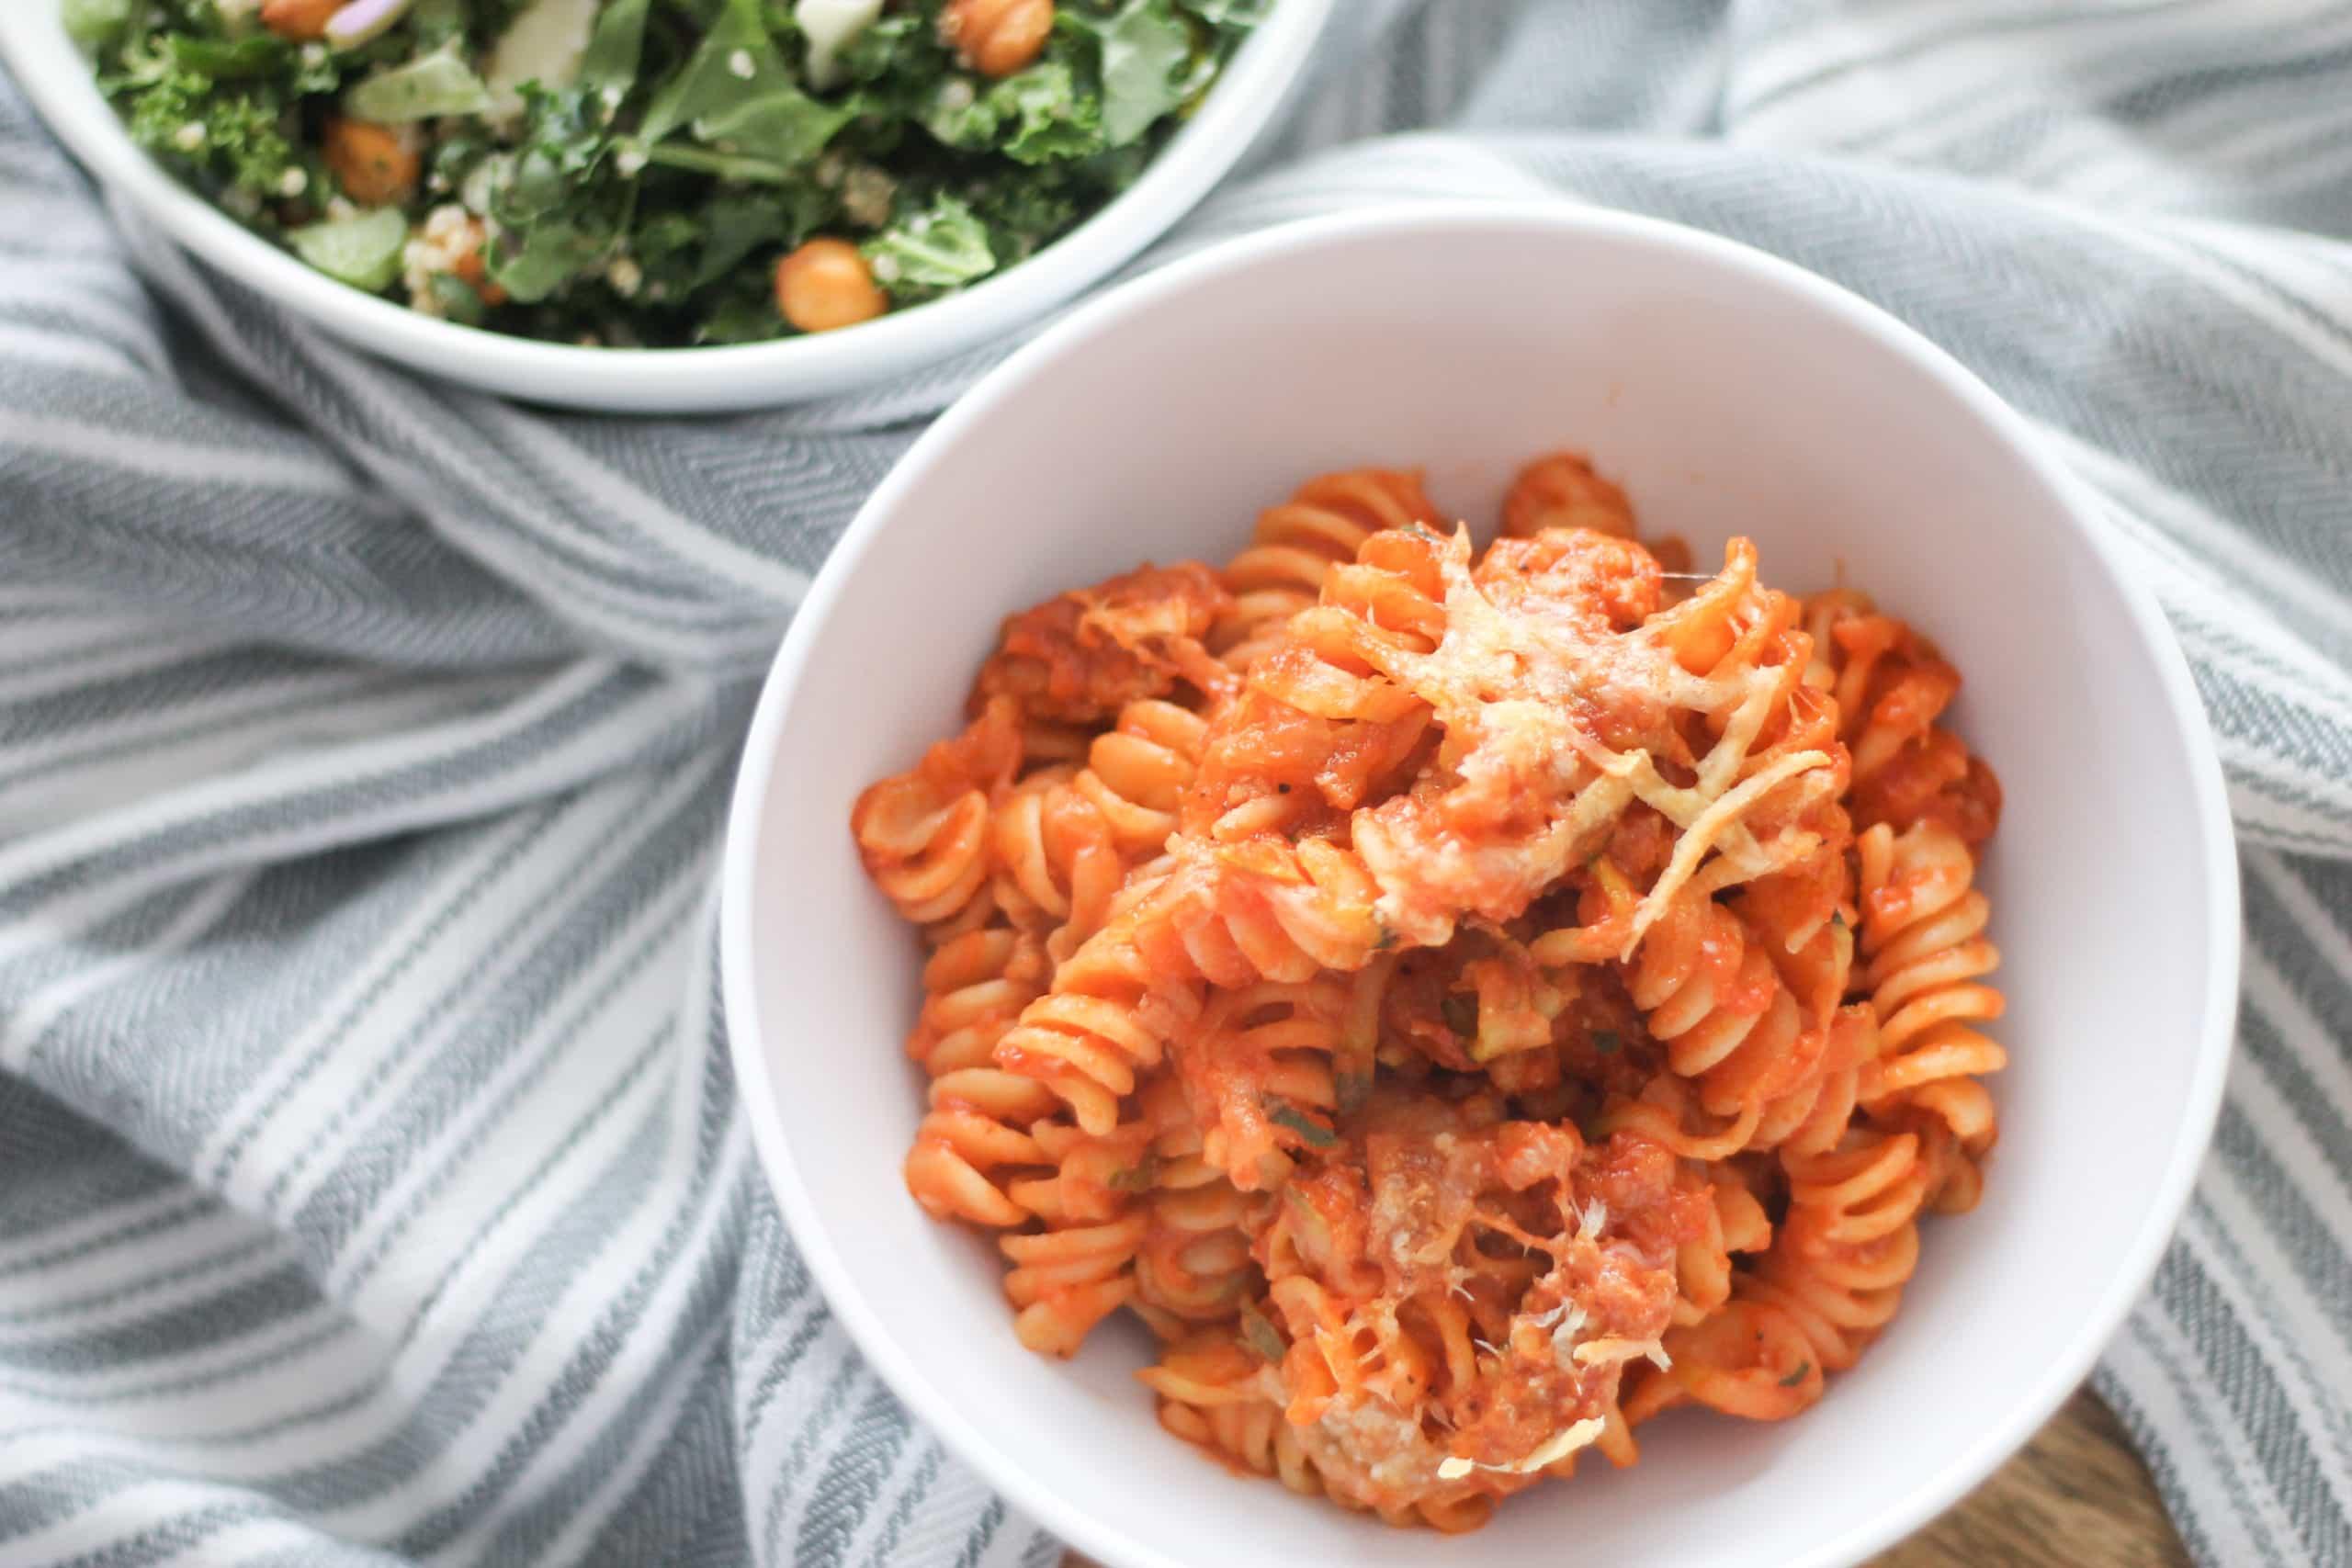 Sausage & Zucchini Pasta